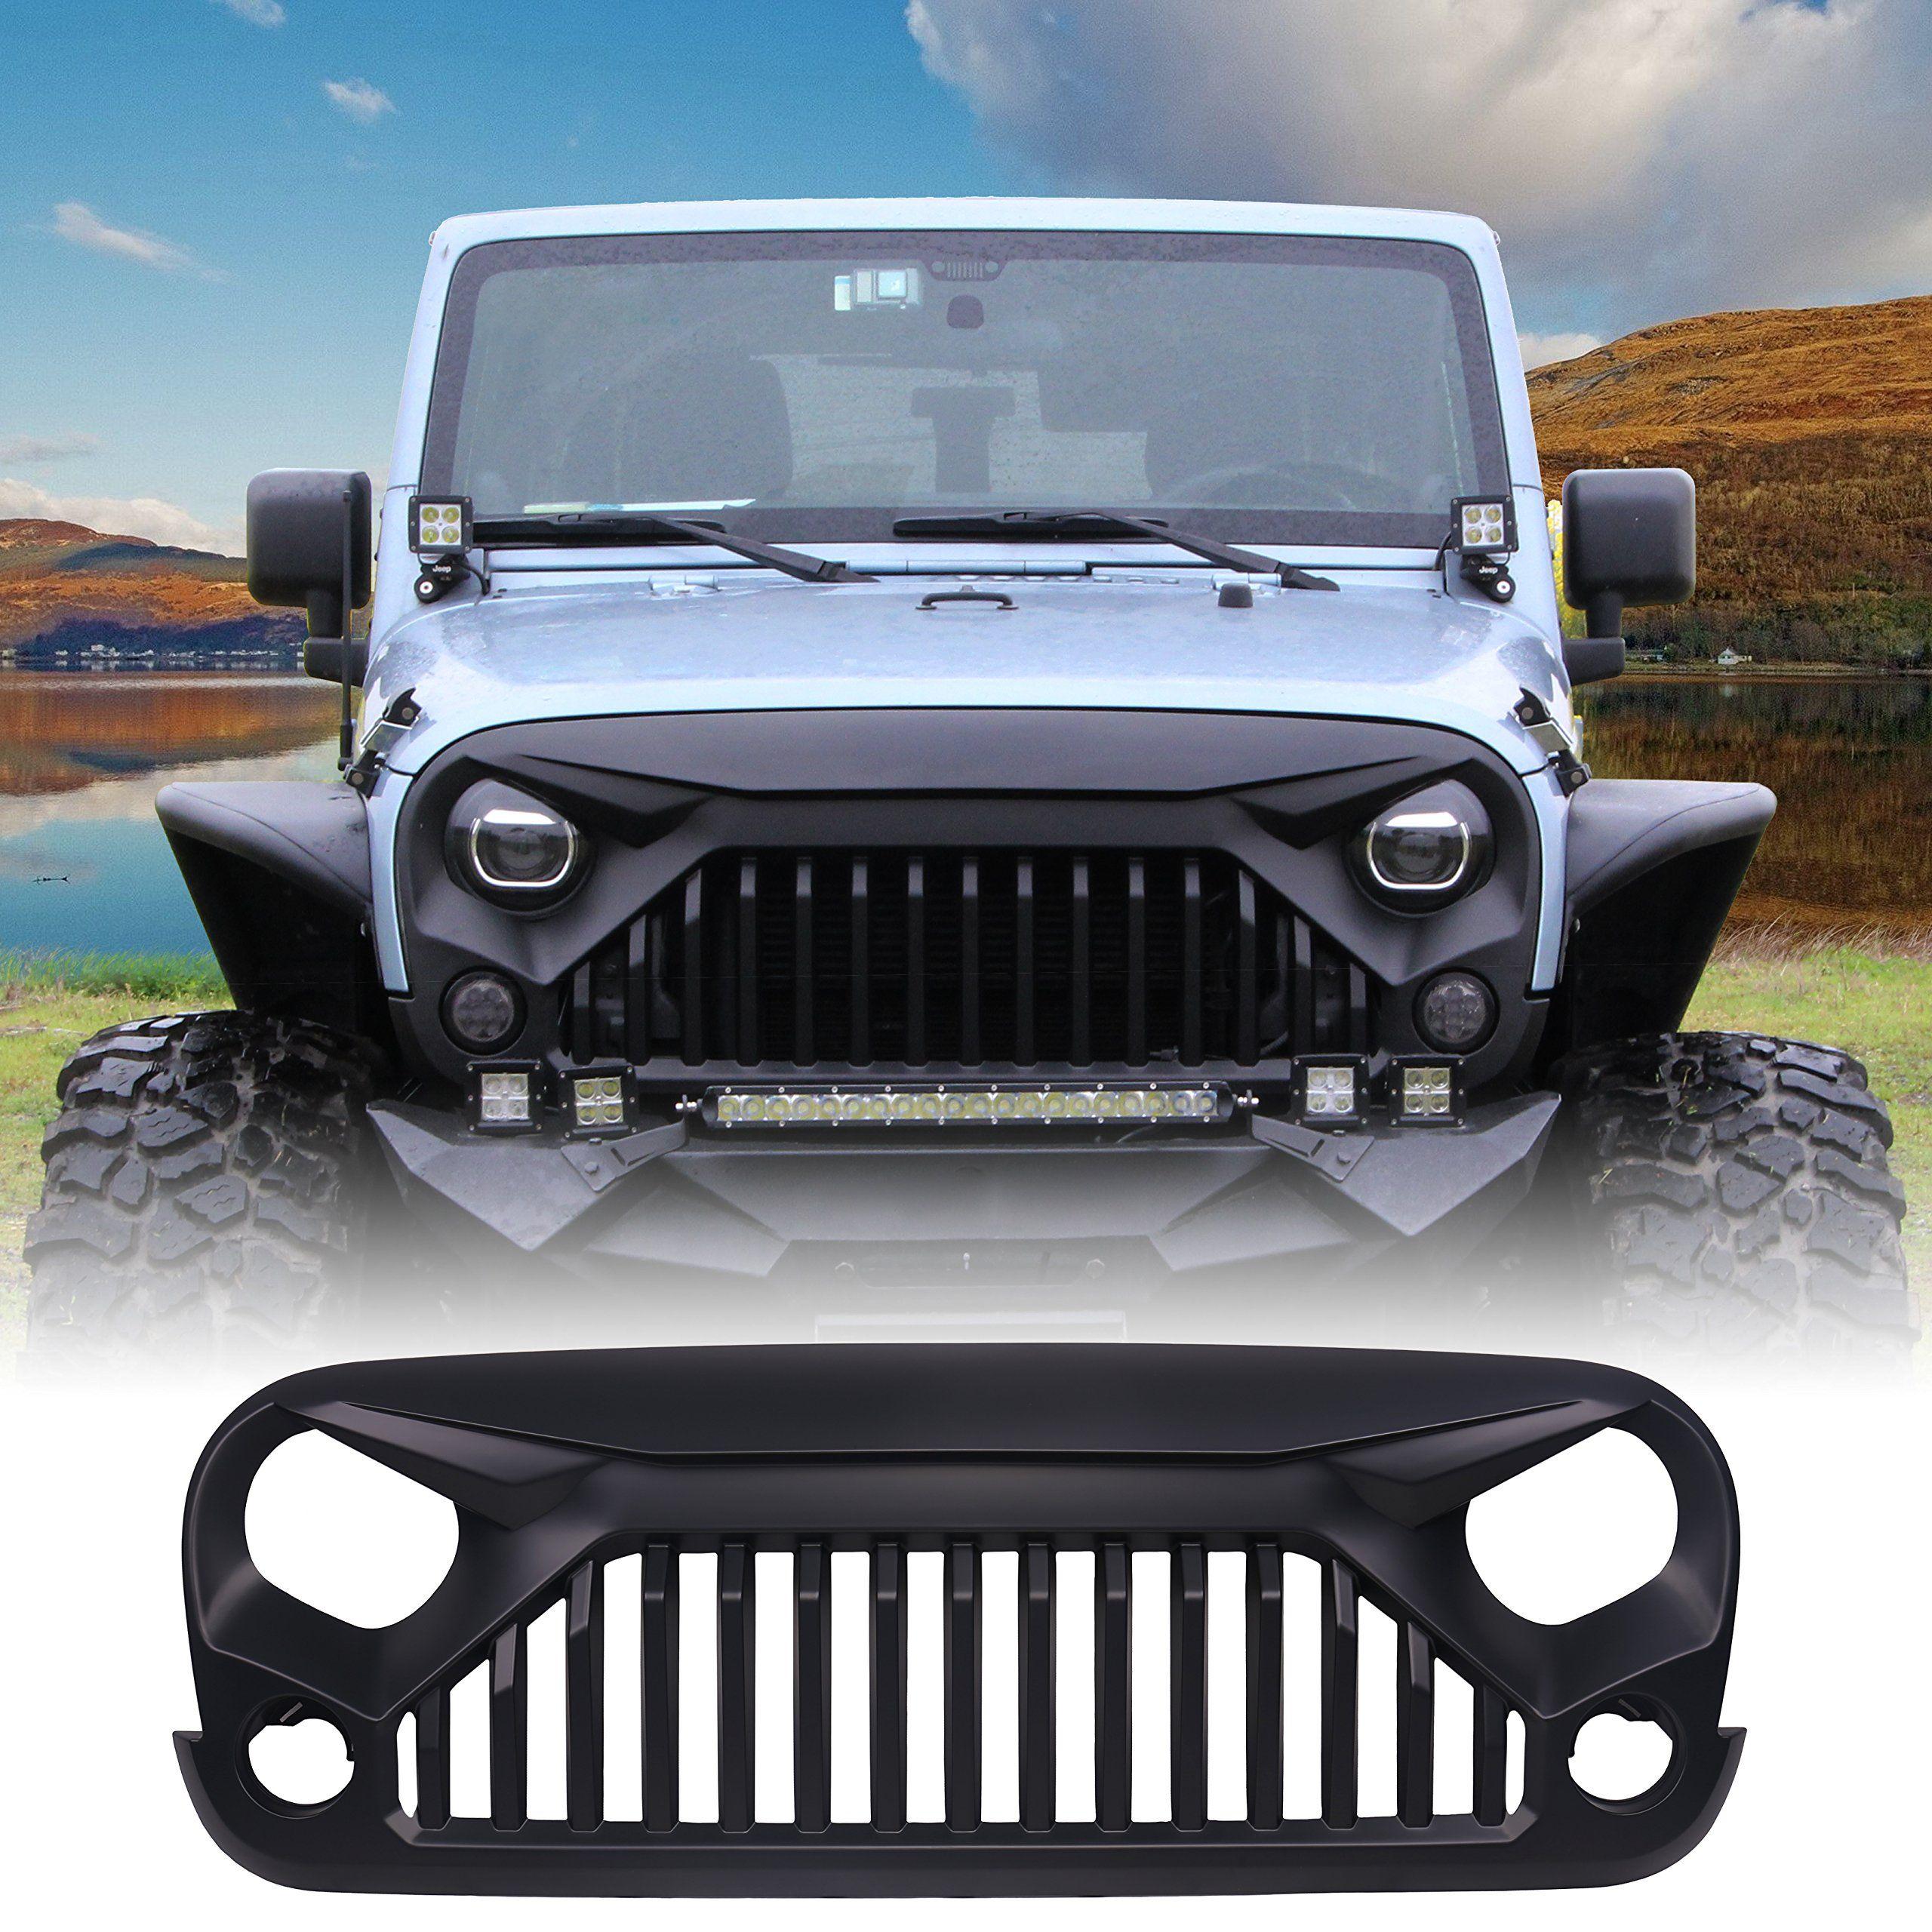 U-MAX Front Matte Black Gladiator Grid Grill for Jeep Wrangler Rubicon  Sahara Sport JK 2007-2017 (Fury Monster)